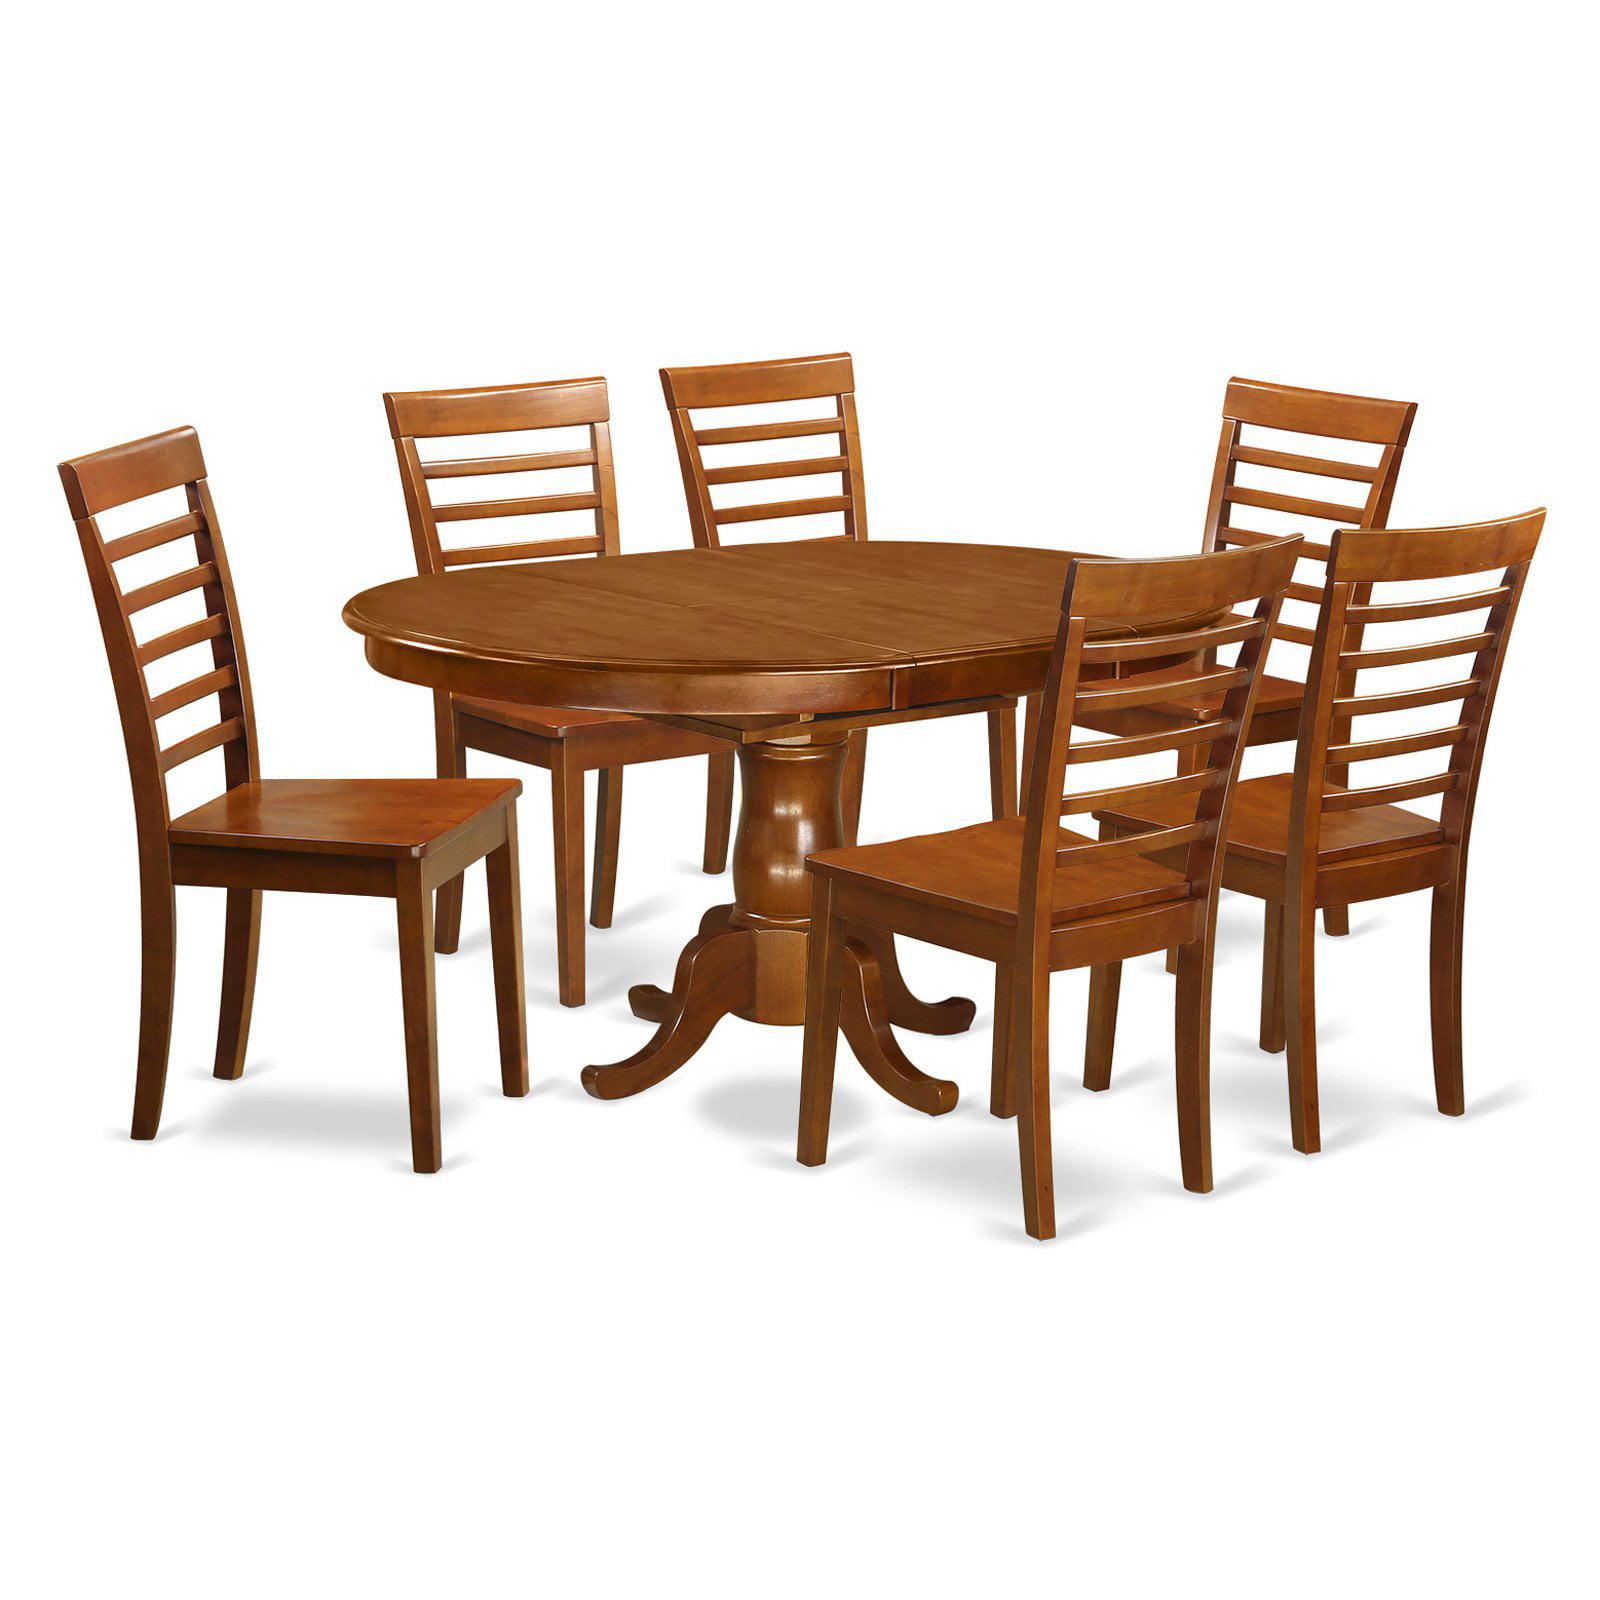 East West Furniture Portland 7 Piece Straight Ladderback Dining Table Set